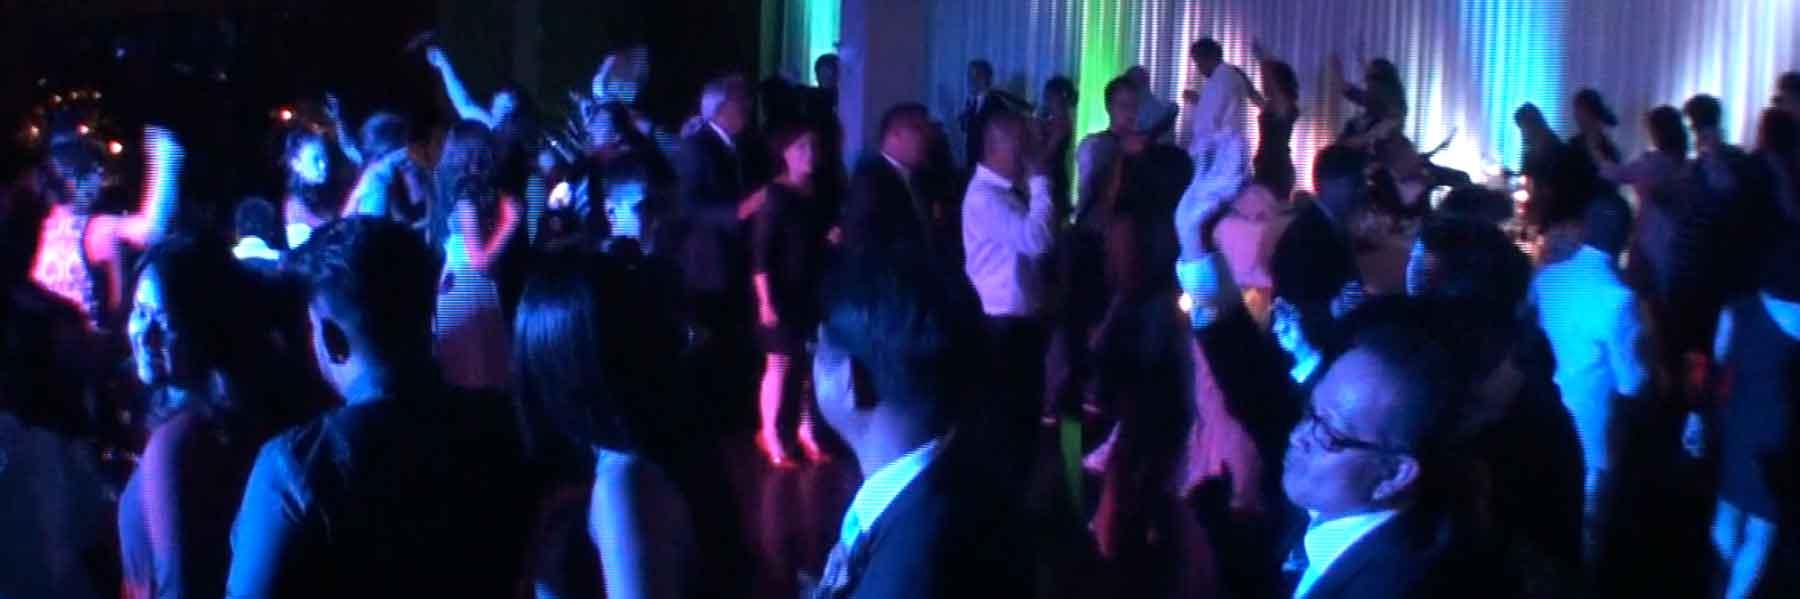 Wedding-Dj-Toronto-Packed-Dancefloor-Bayview-Golf